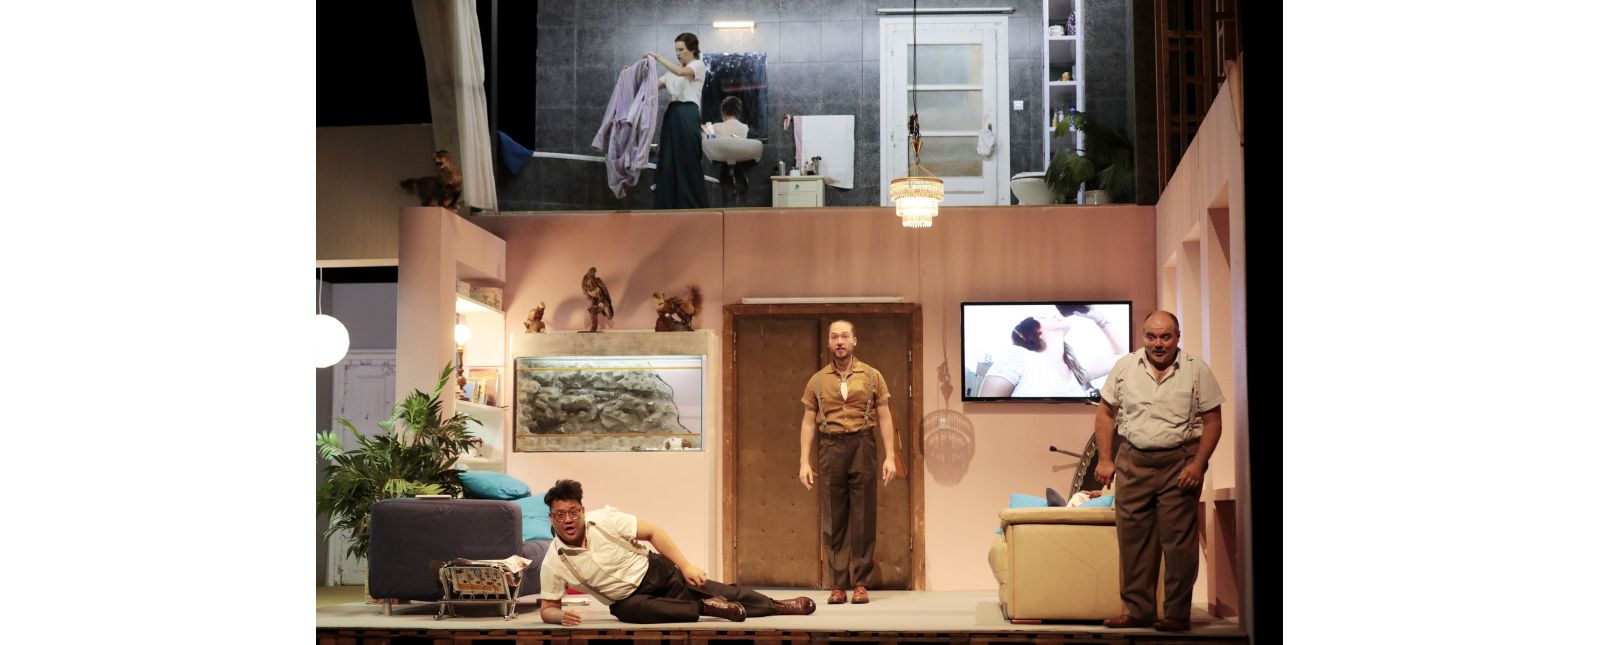 DIE 7 TODSÜNDEN & MOTHERLAND // Junbum Lee / Inga Schäfer / John Carpenter / Roberto Gionfriddo // 2020 // Paul Leclaire